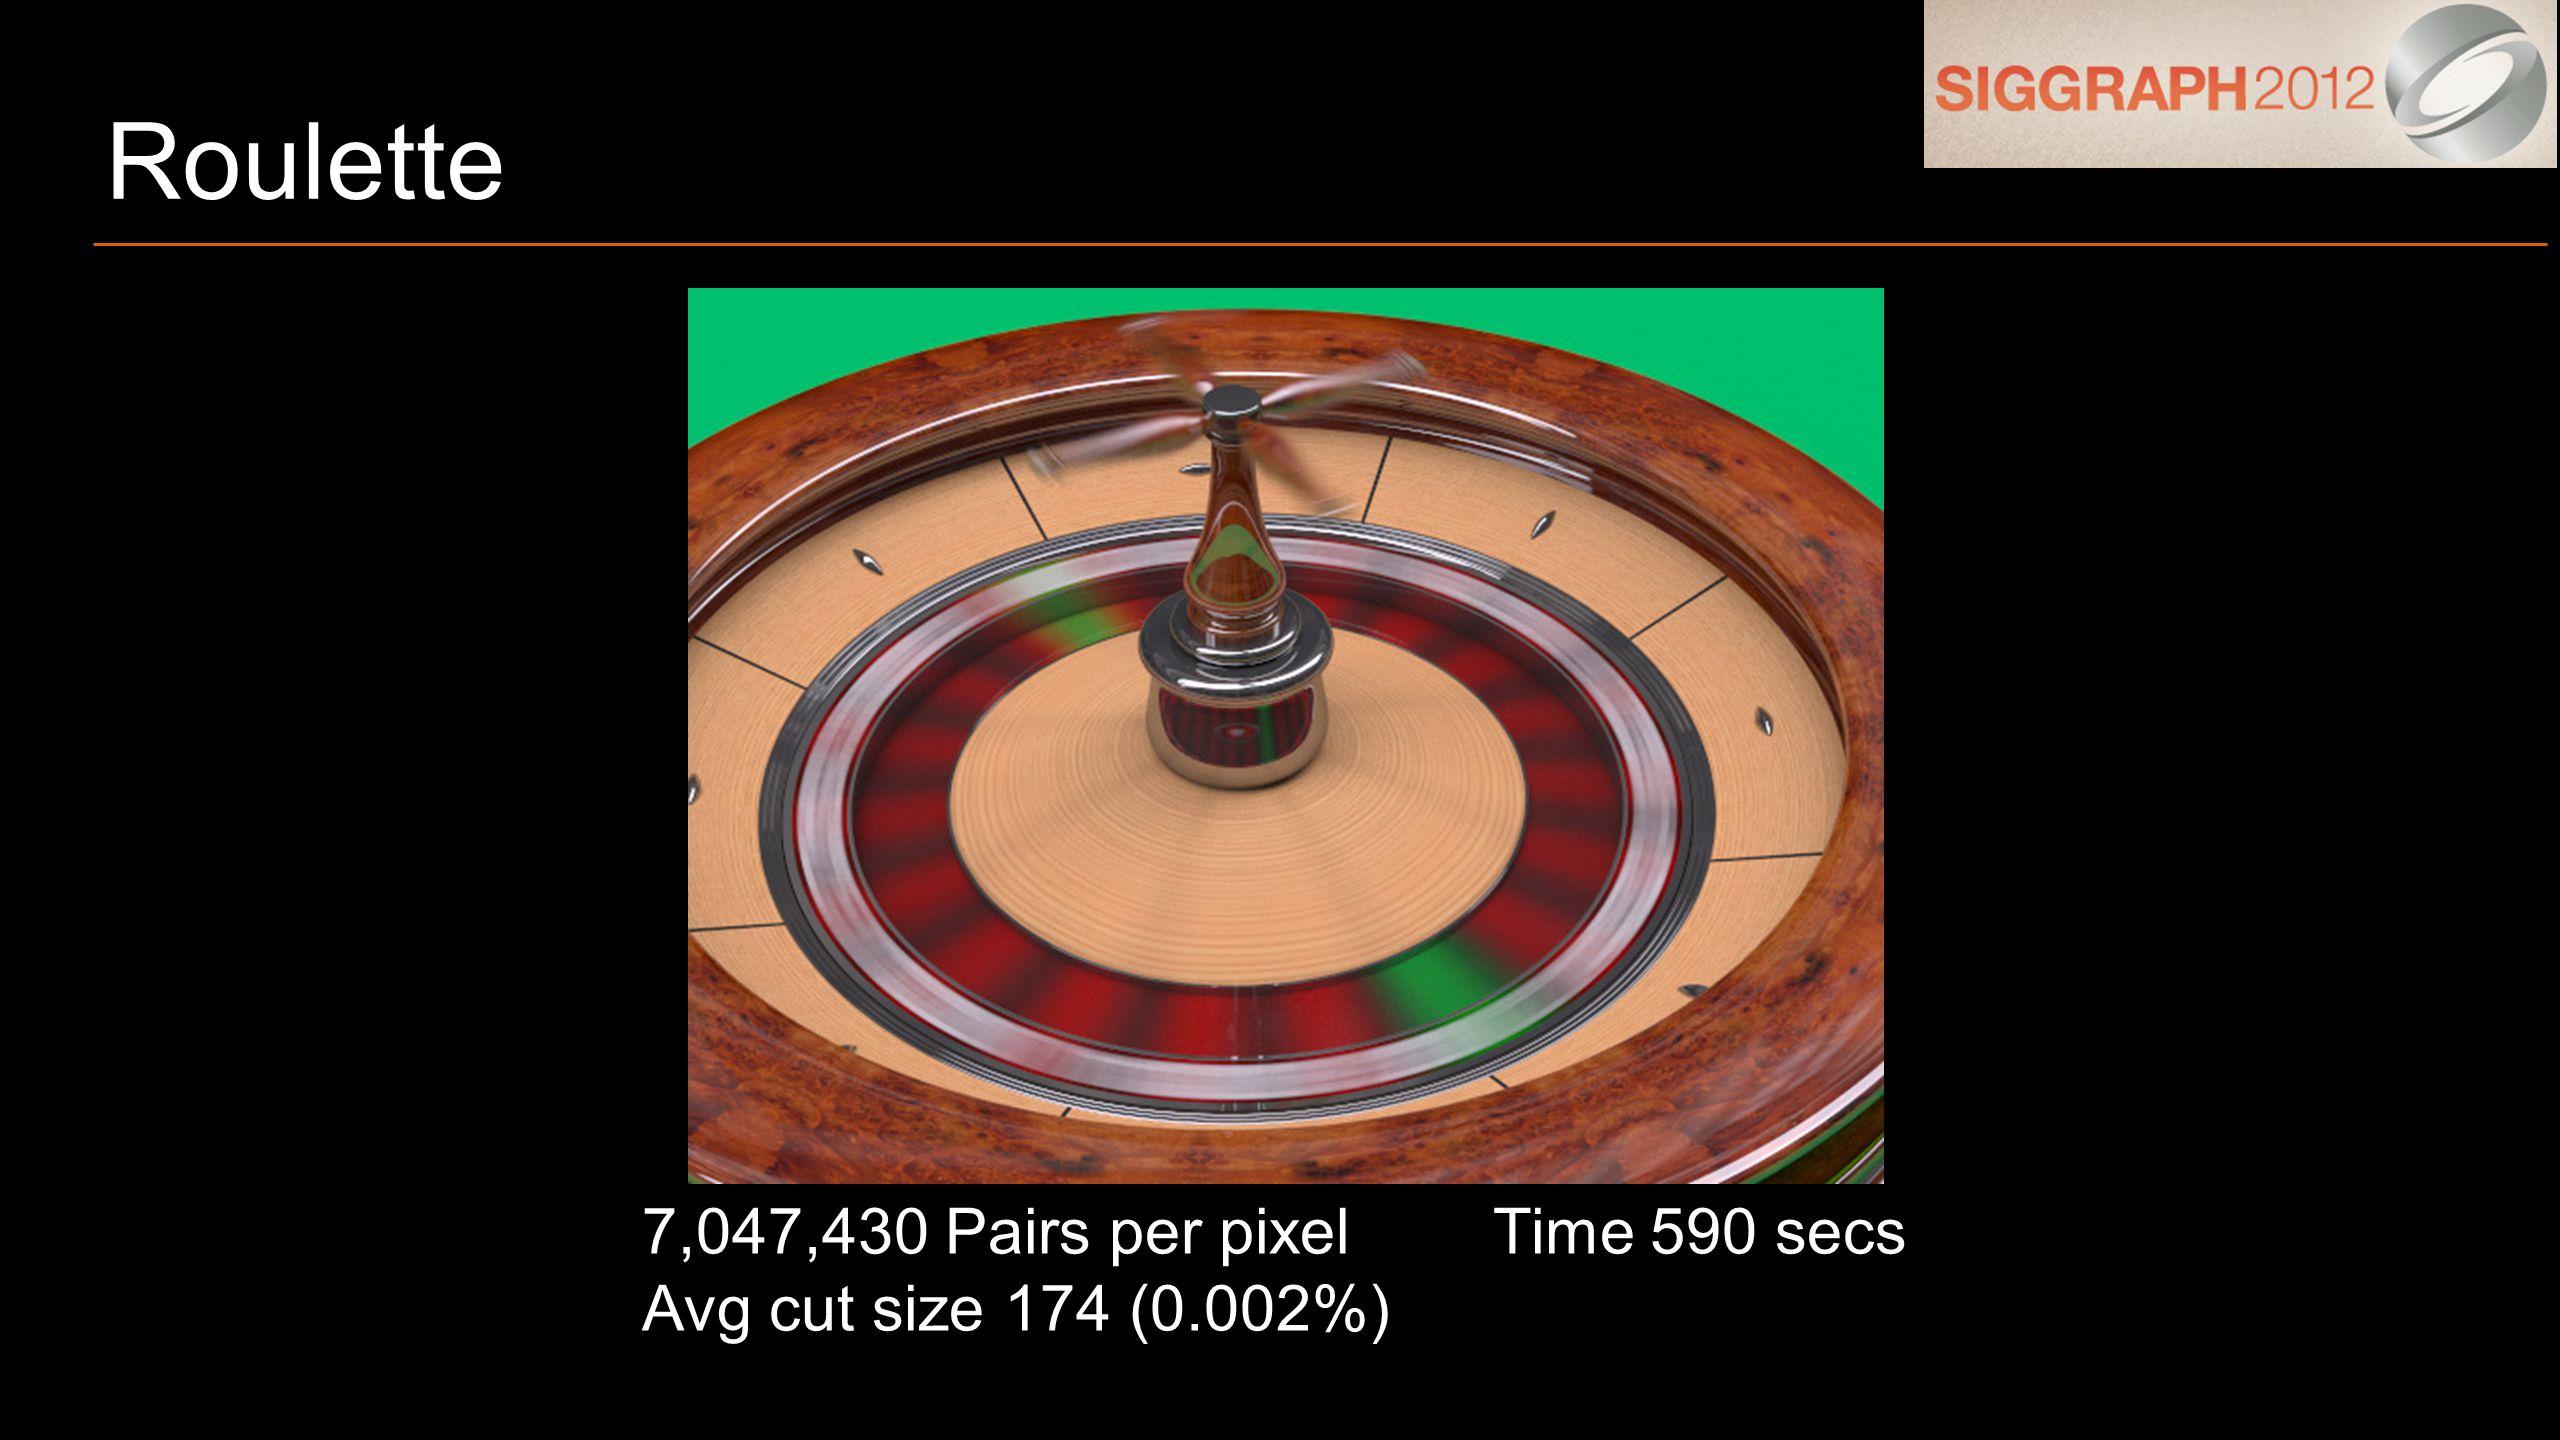 Roulette 7,047,430 Pairs per pixel Time 590 secs Avg cut size 174 (0.002%)